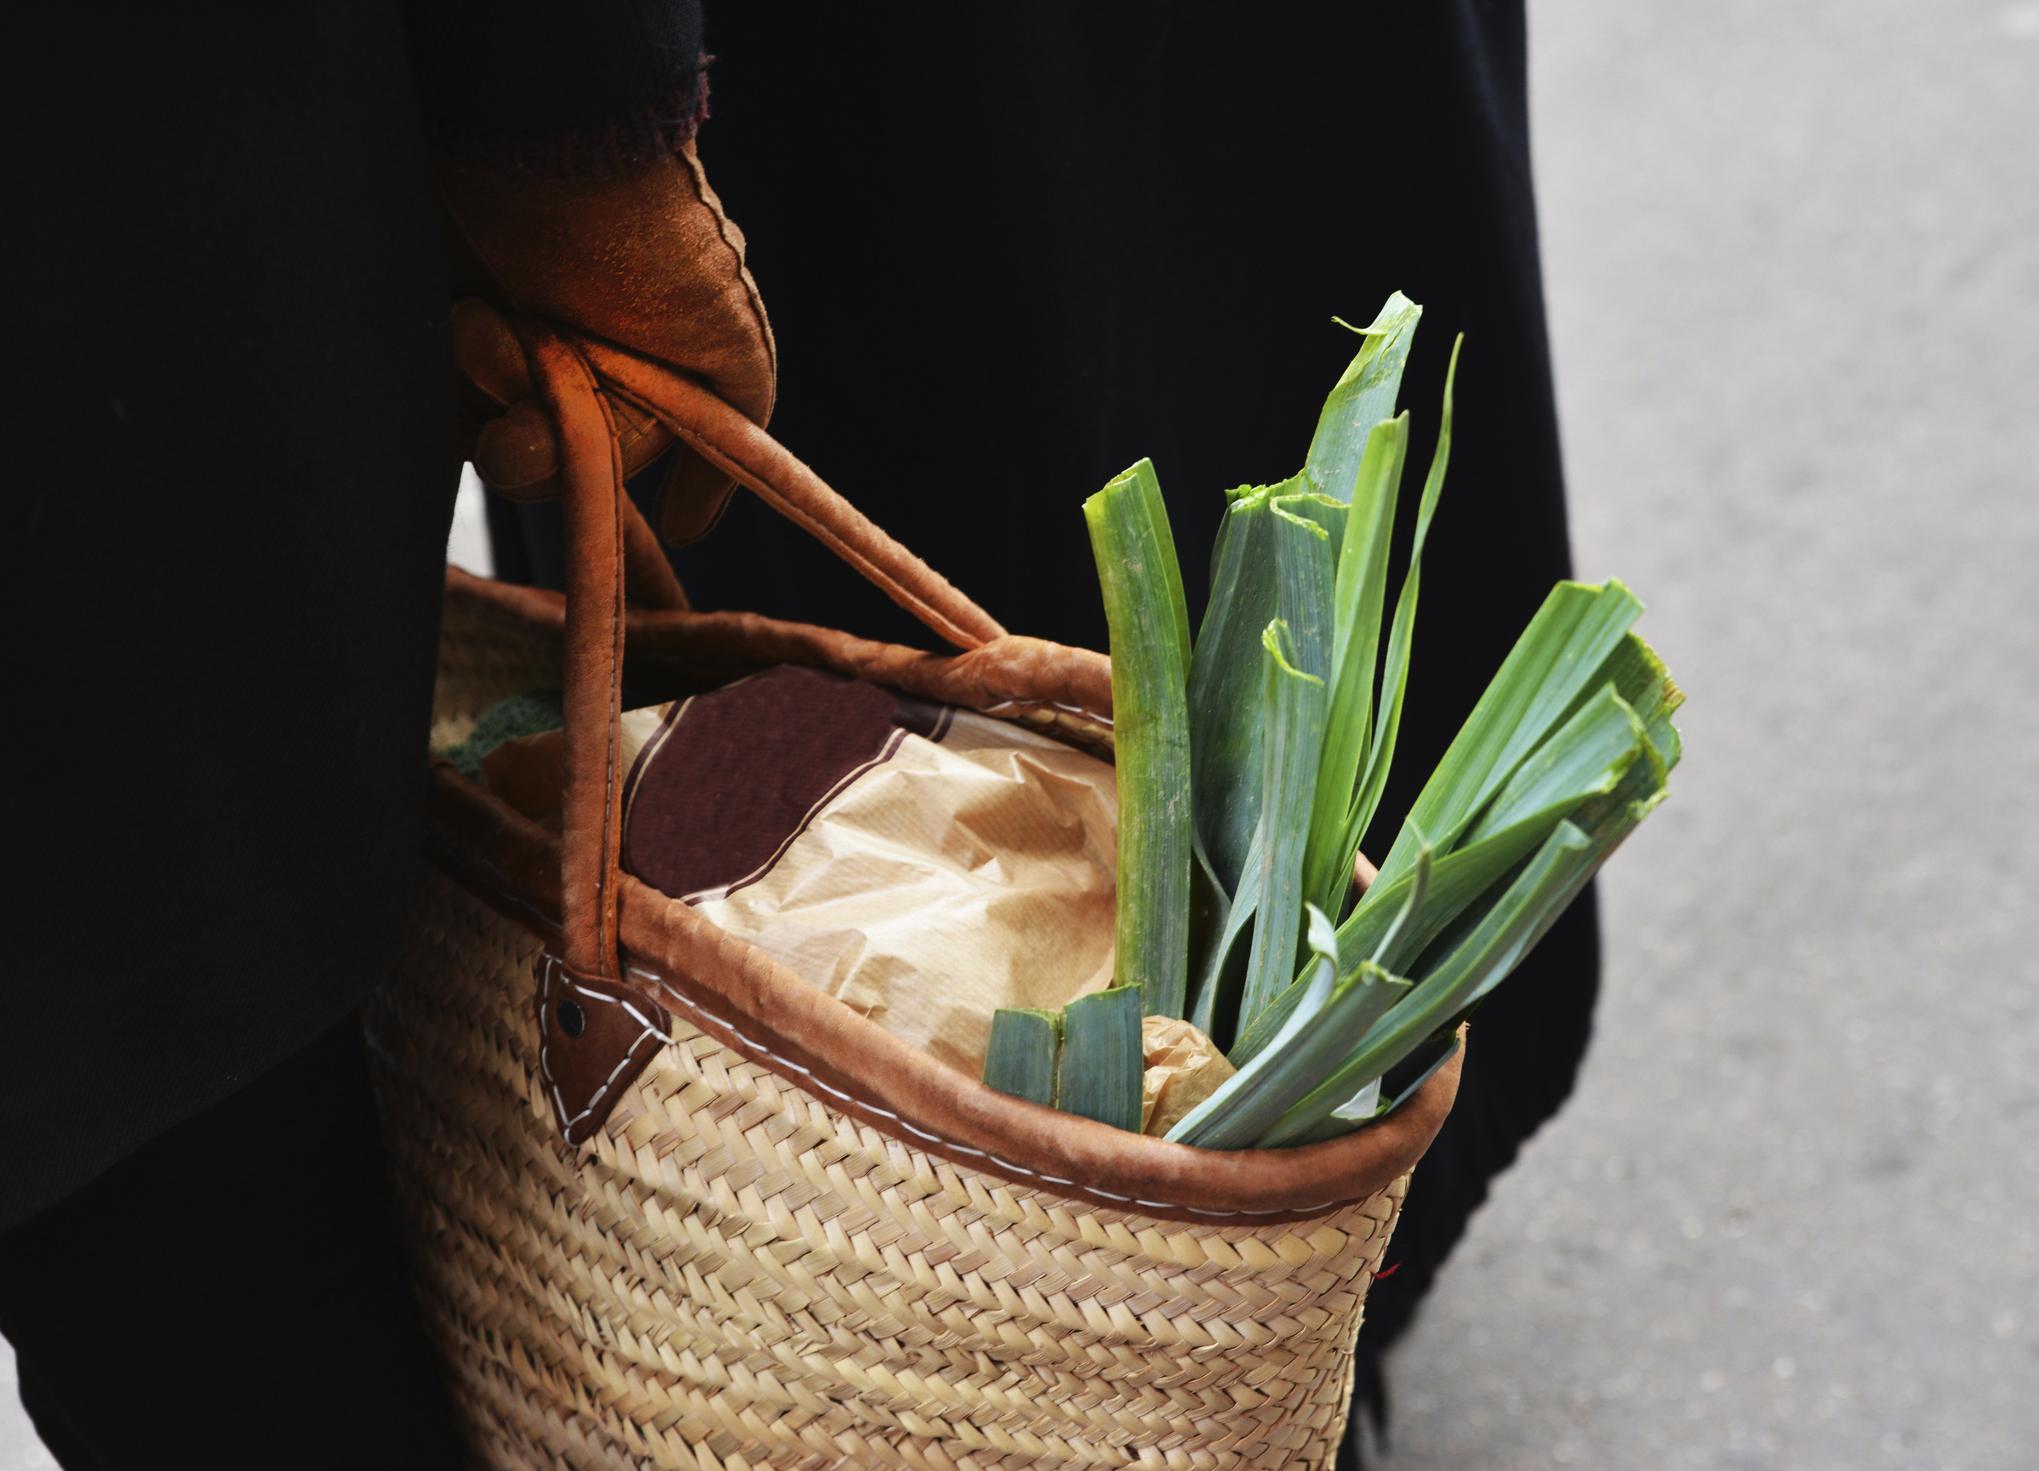 leek in a straw reusable grocery bag farmers market